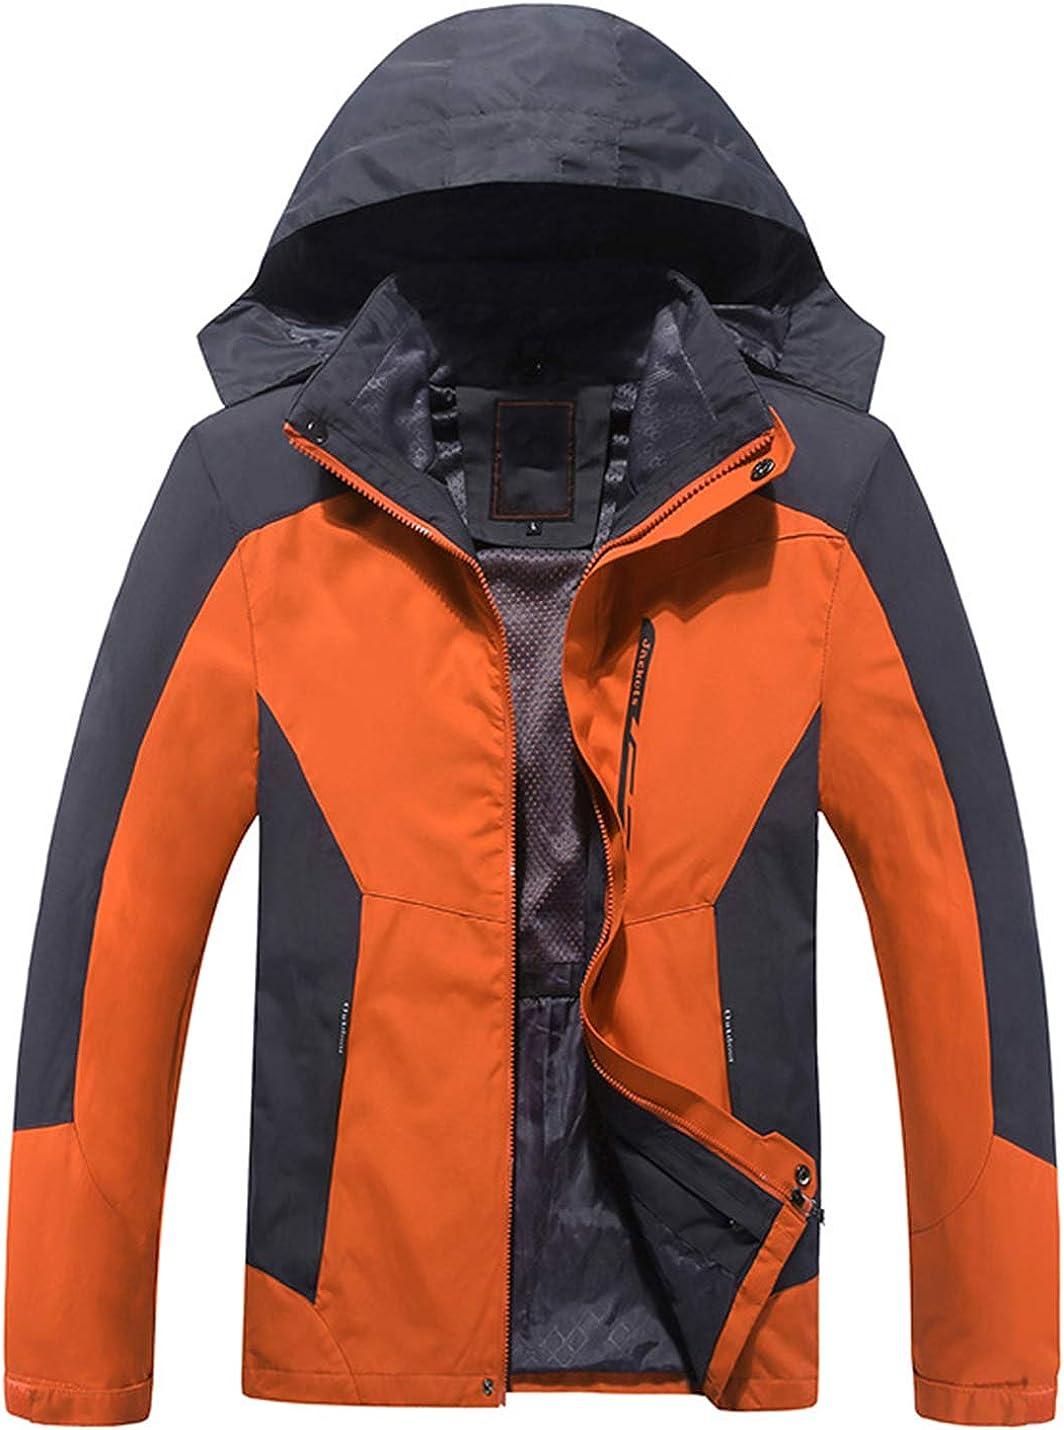 Uaneo Mens Casual Detachable Hood Waterproof Fleece Lined Outdoor Mountain Jackets(Orange-M)